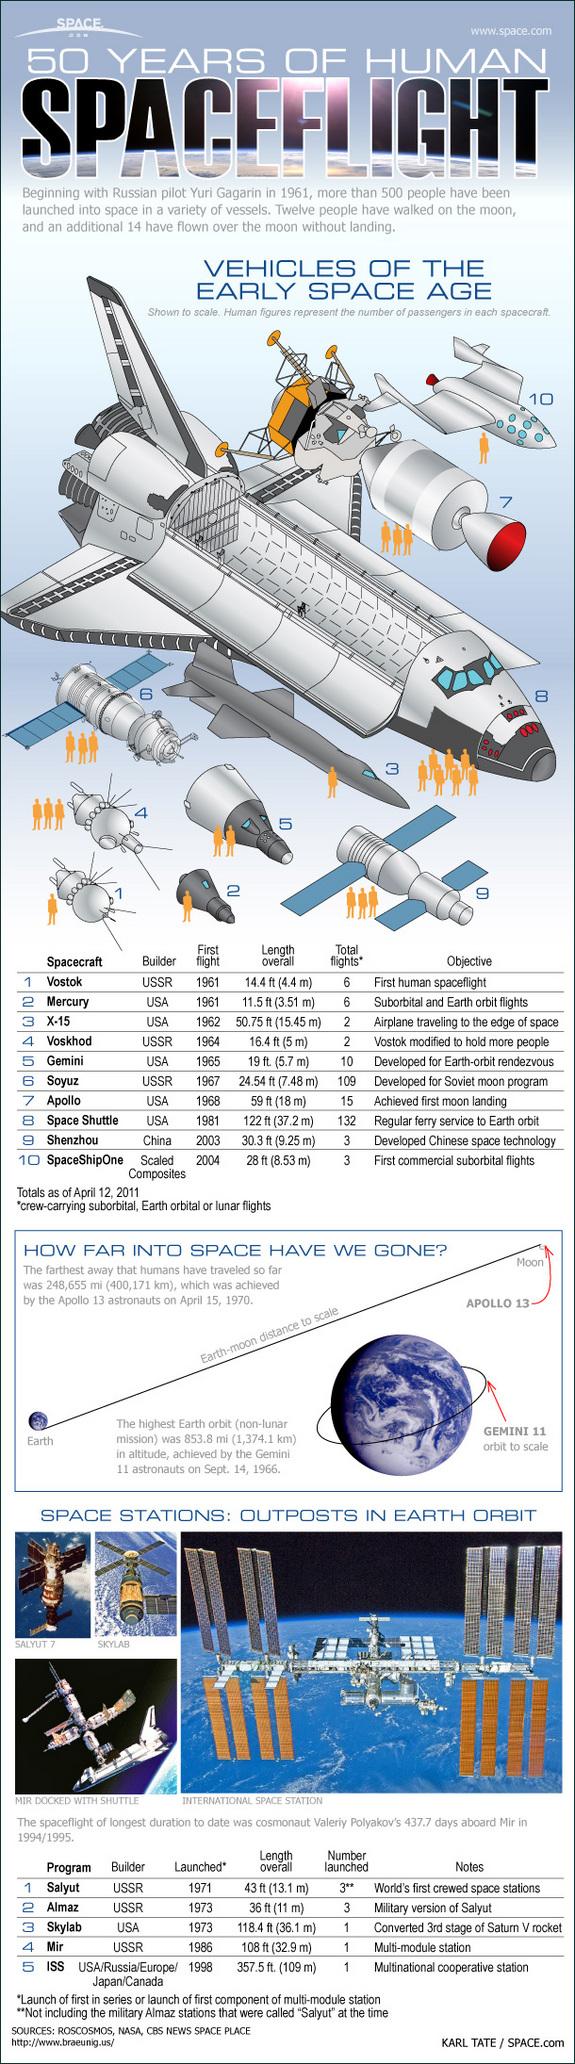 50-Years-Human-Spaceflight-infographic